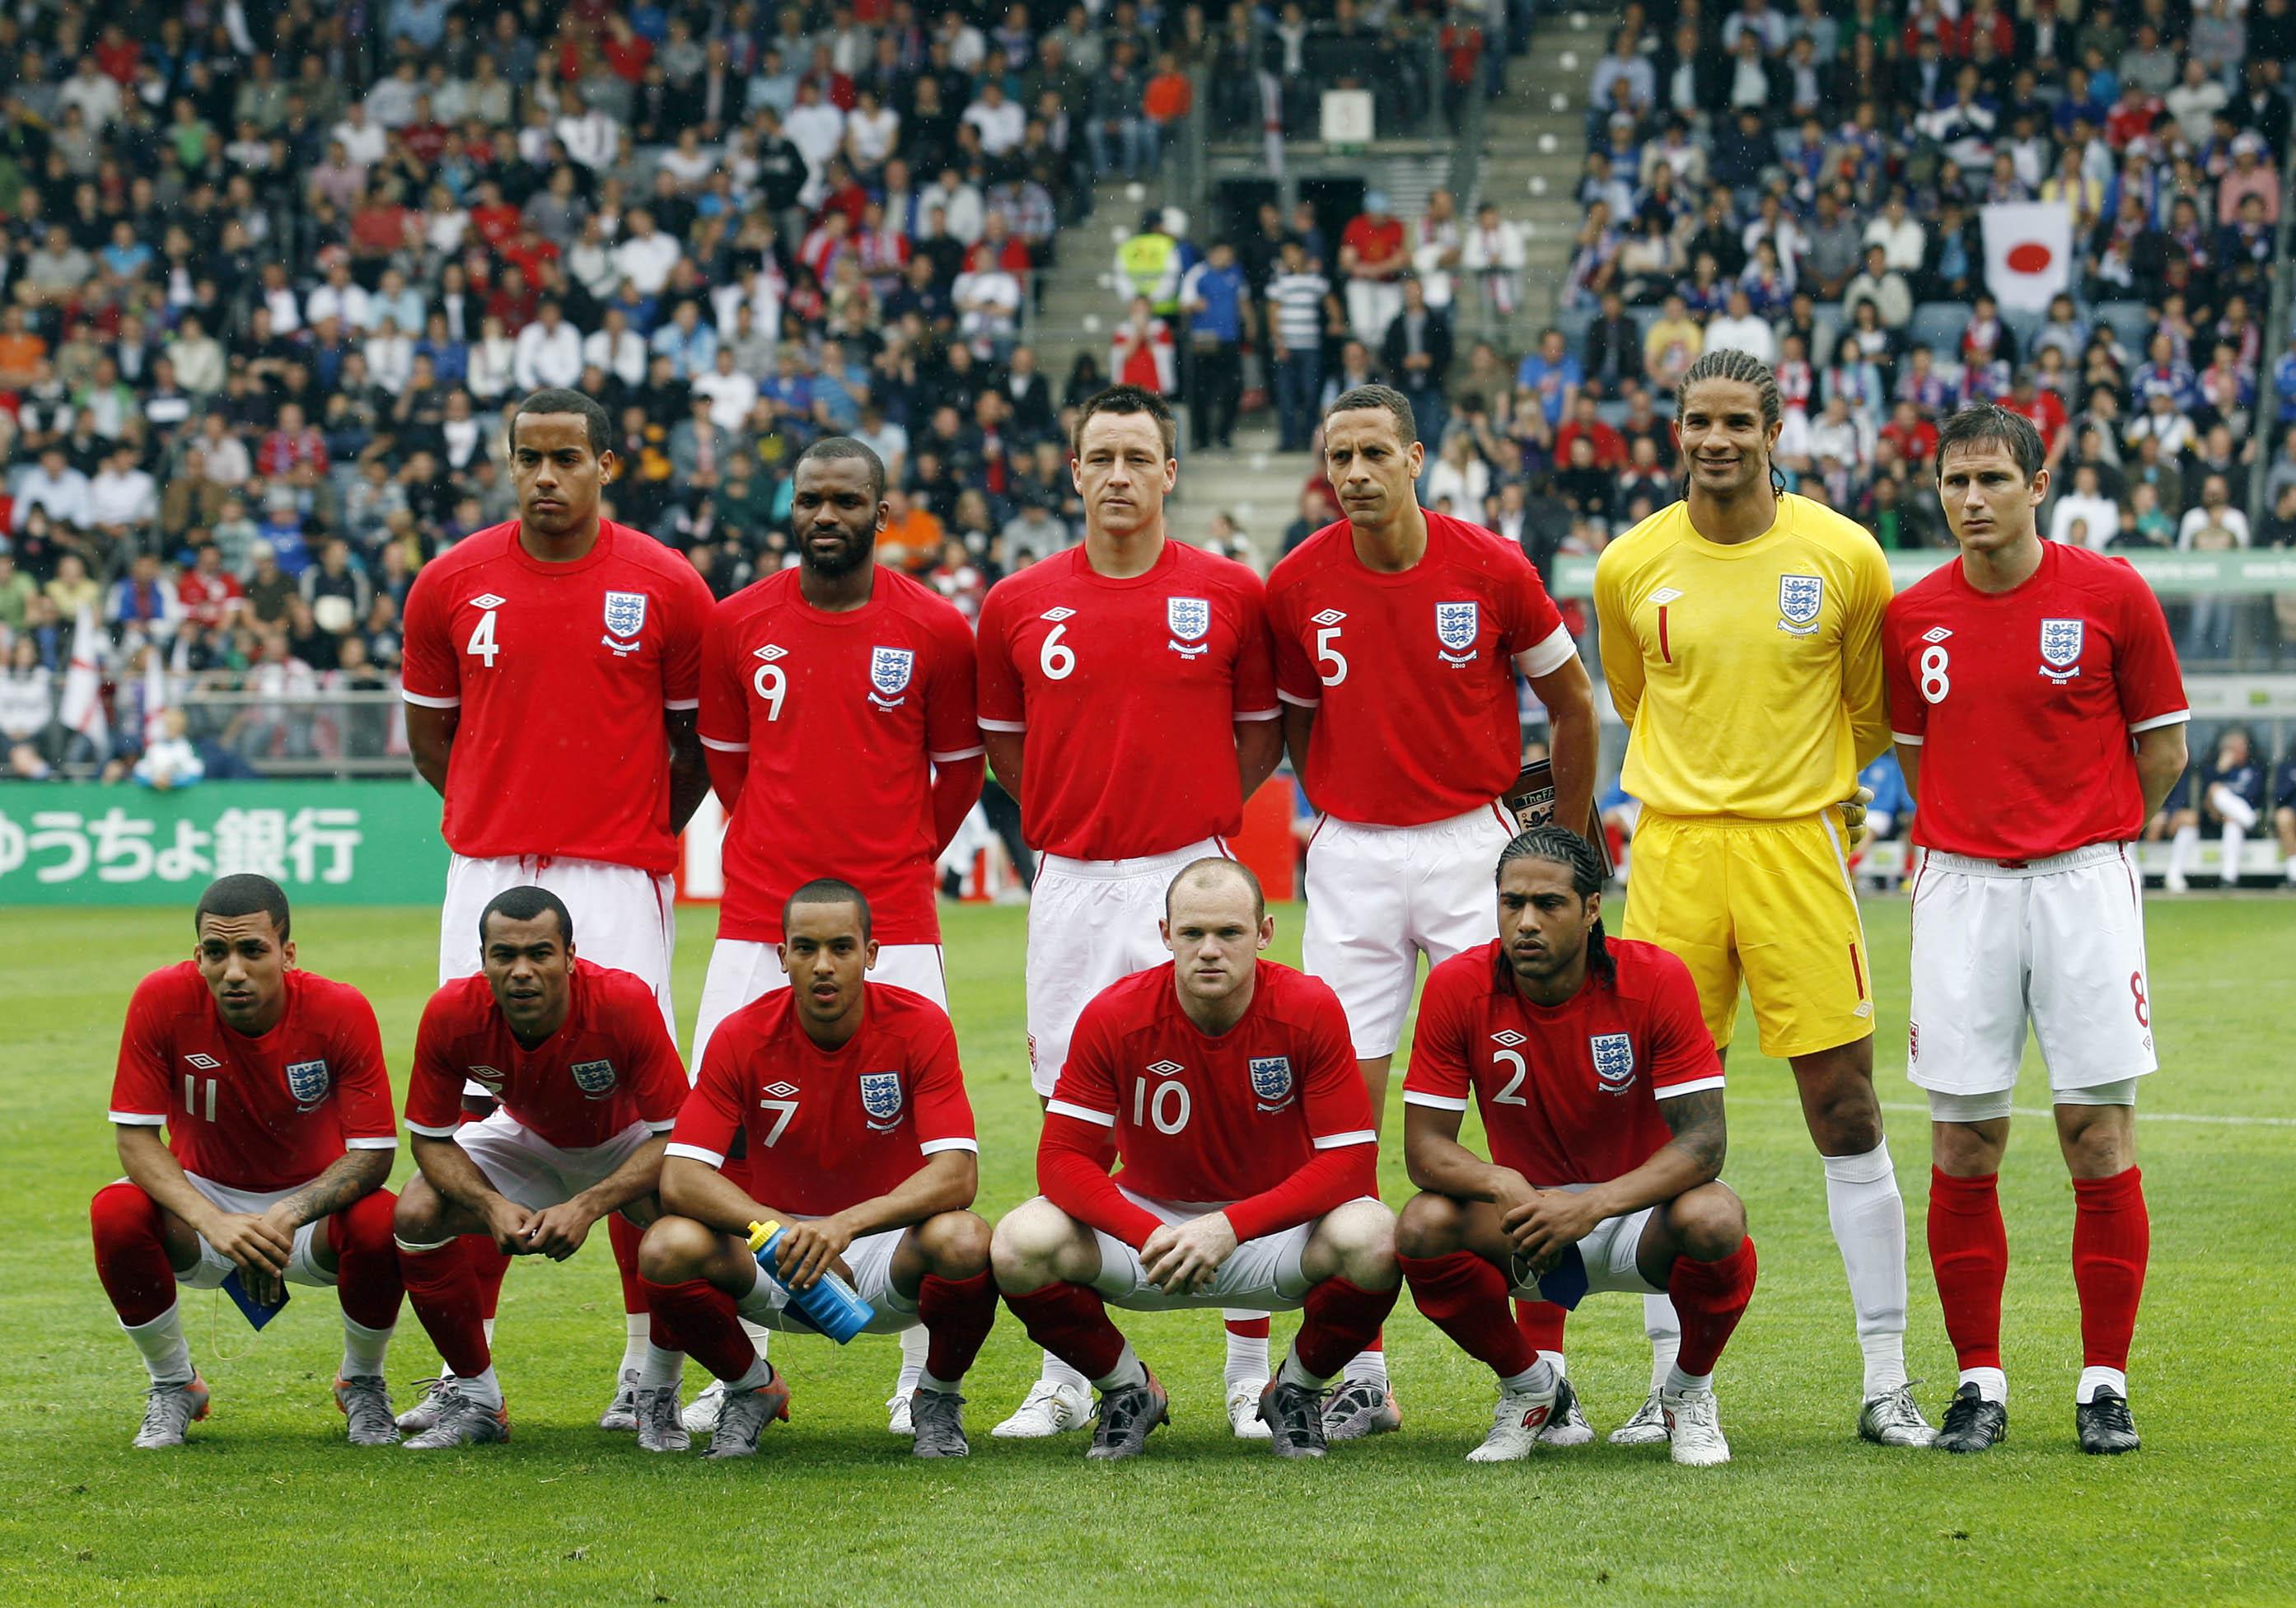 England soccer wallpaper